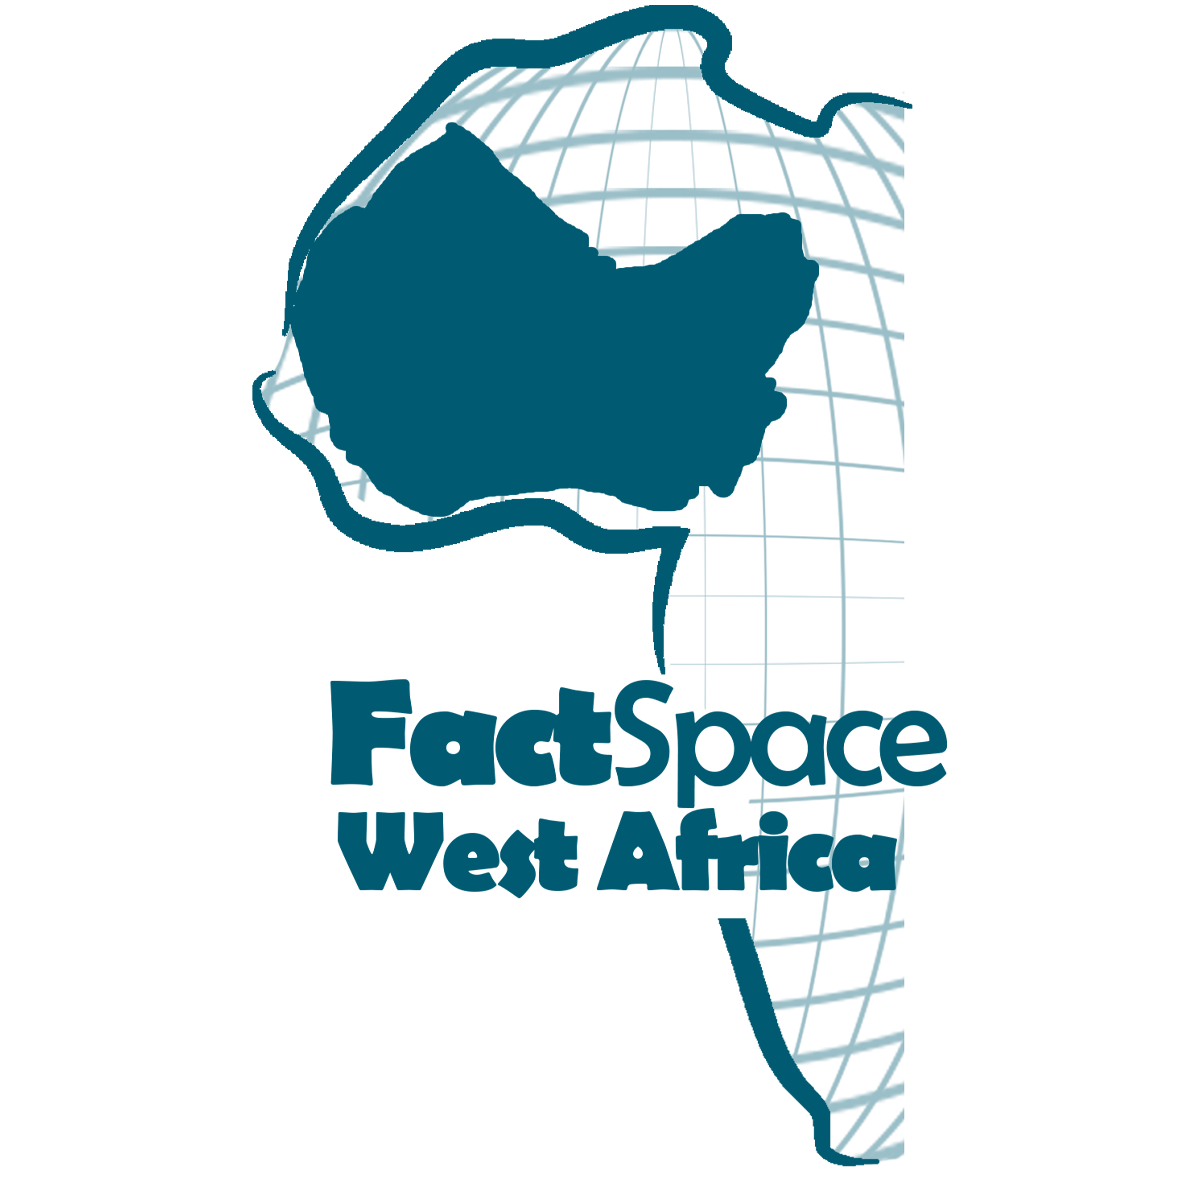 FactSpace West Africa - GhanaFact